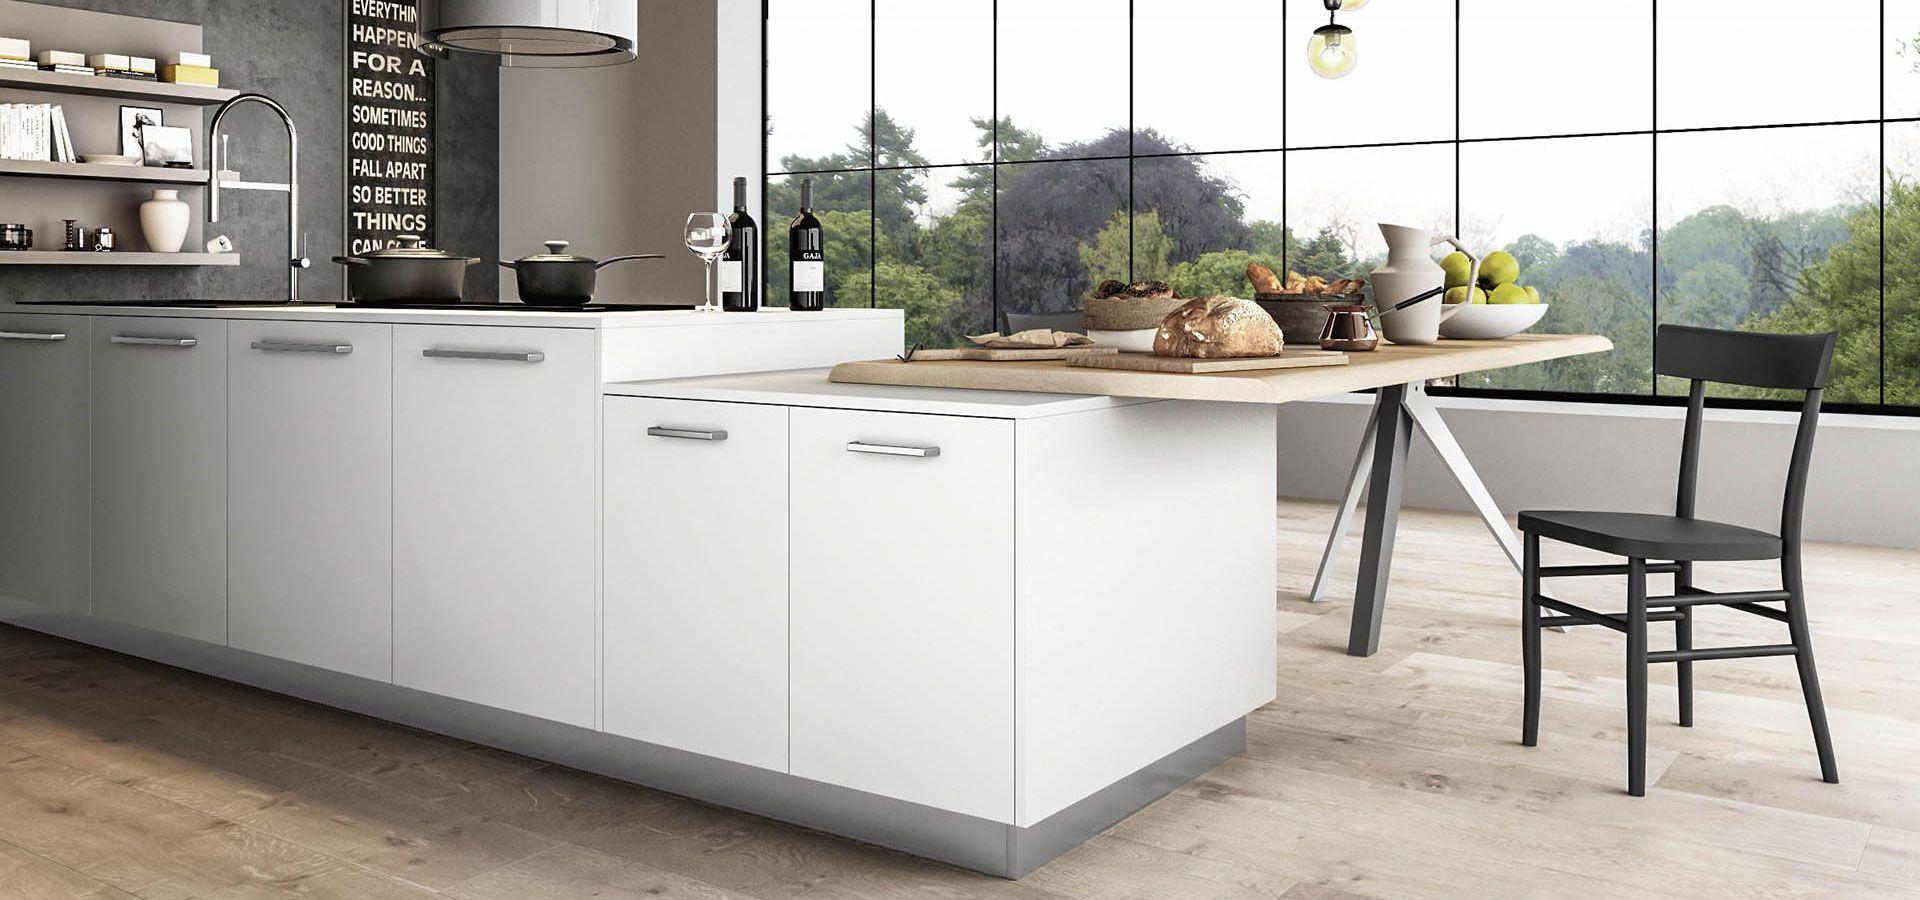 Cucina Moderna - Time Finiture: bianco glass opaco, grigio cenere ...